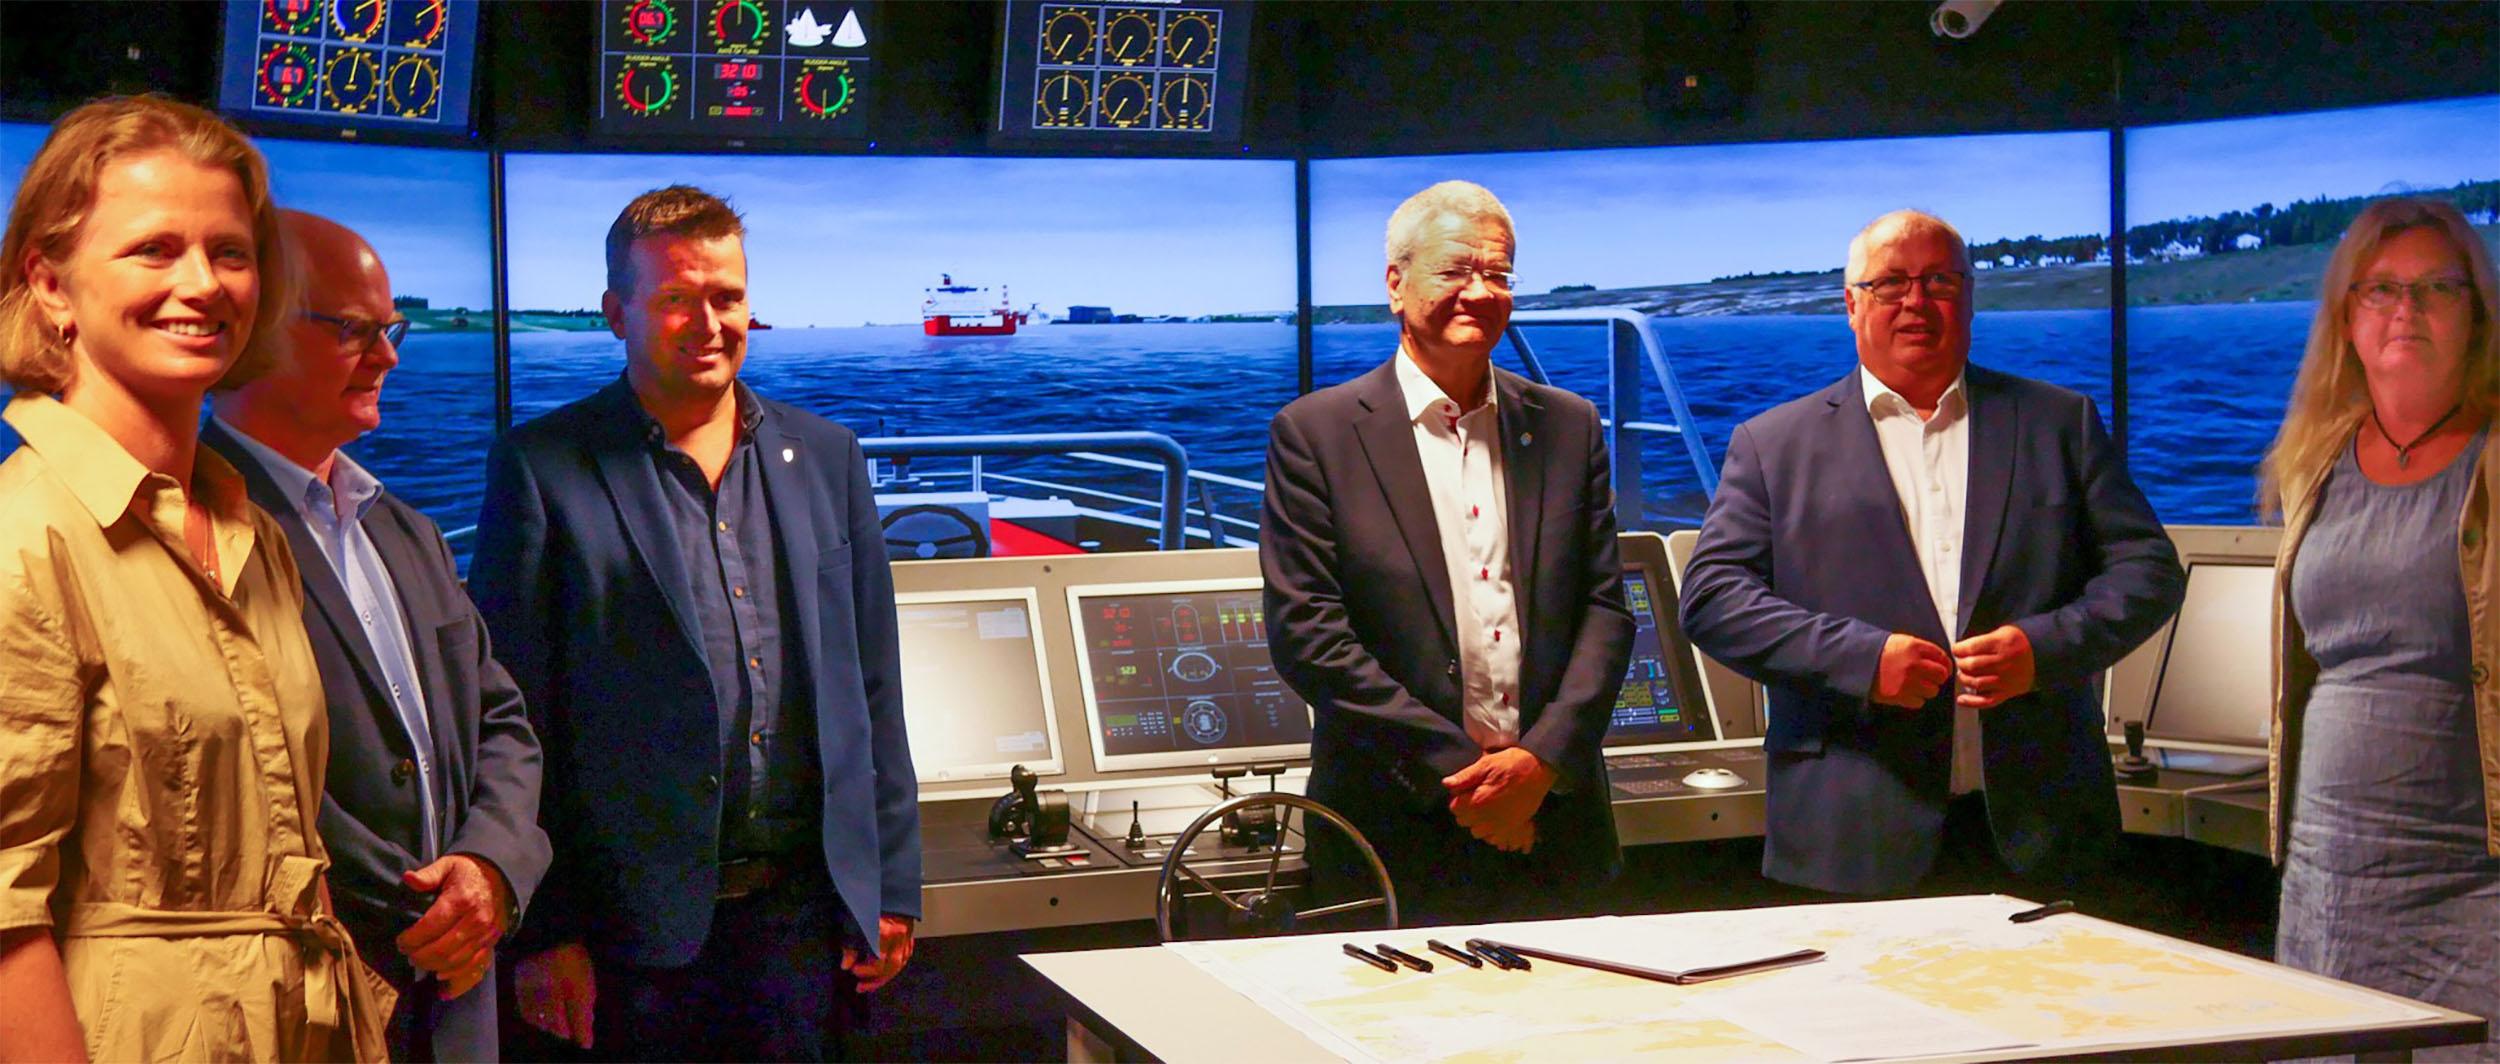 Collaboration formed at Haugesund simulator centre